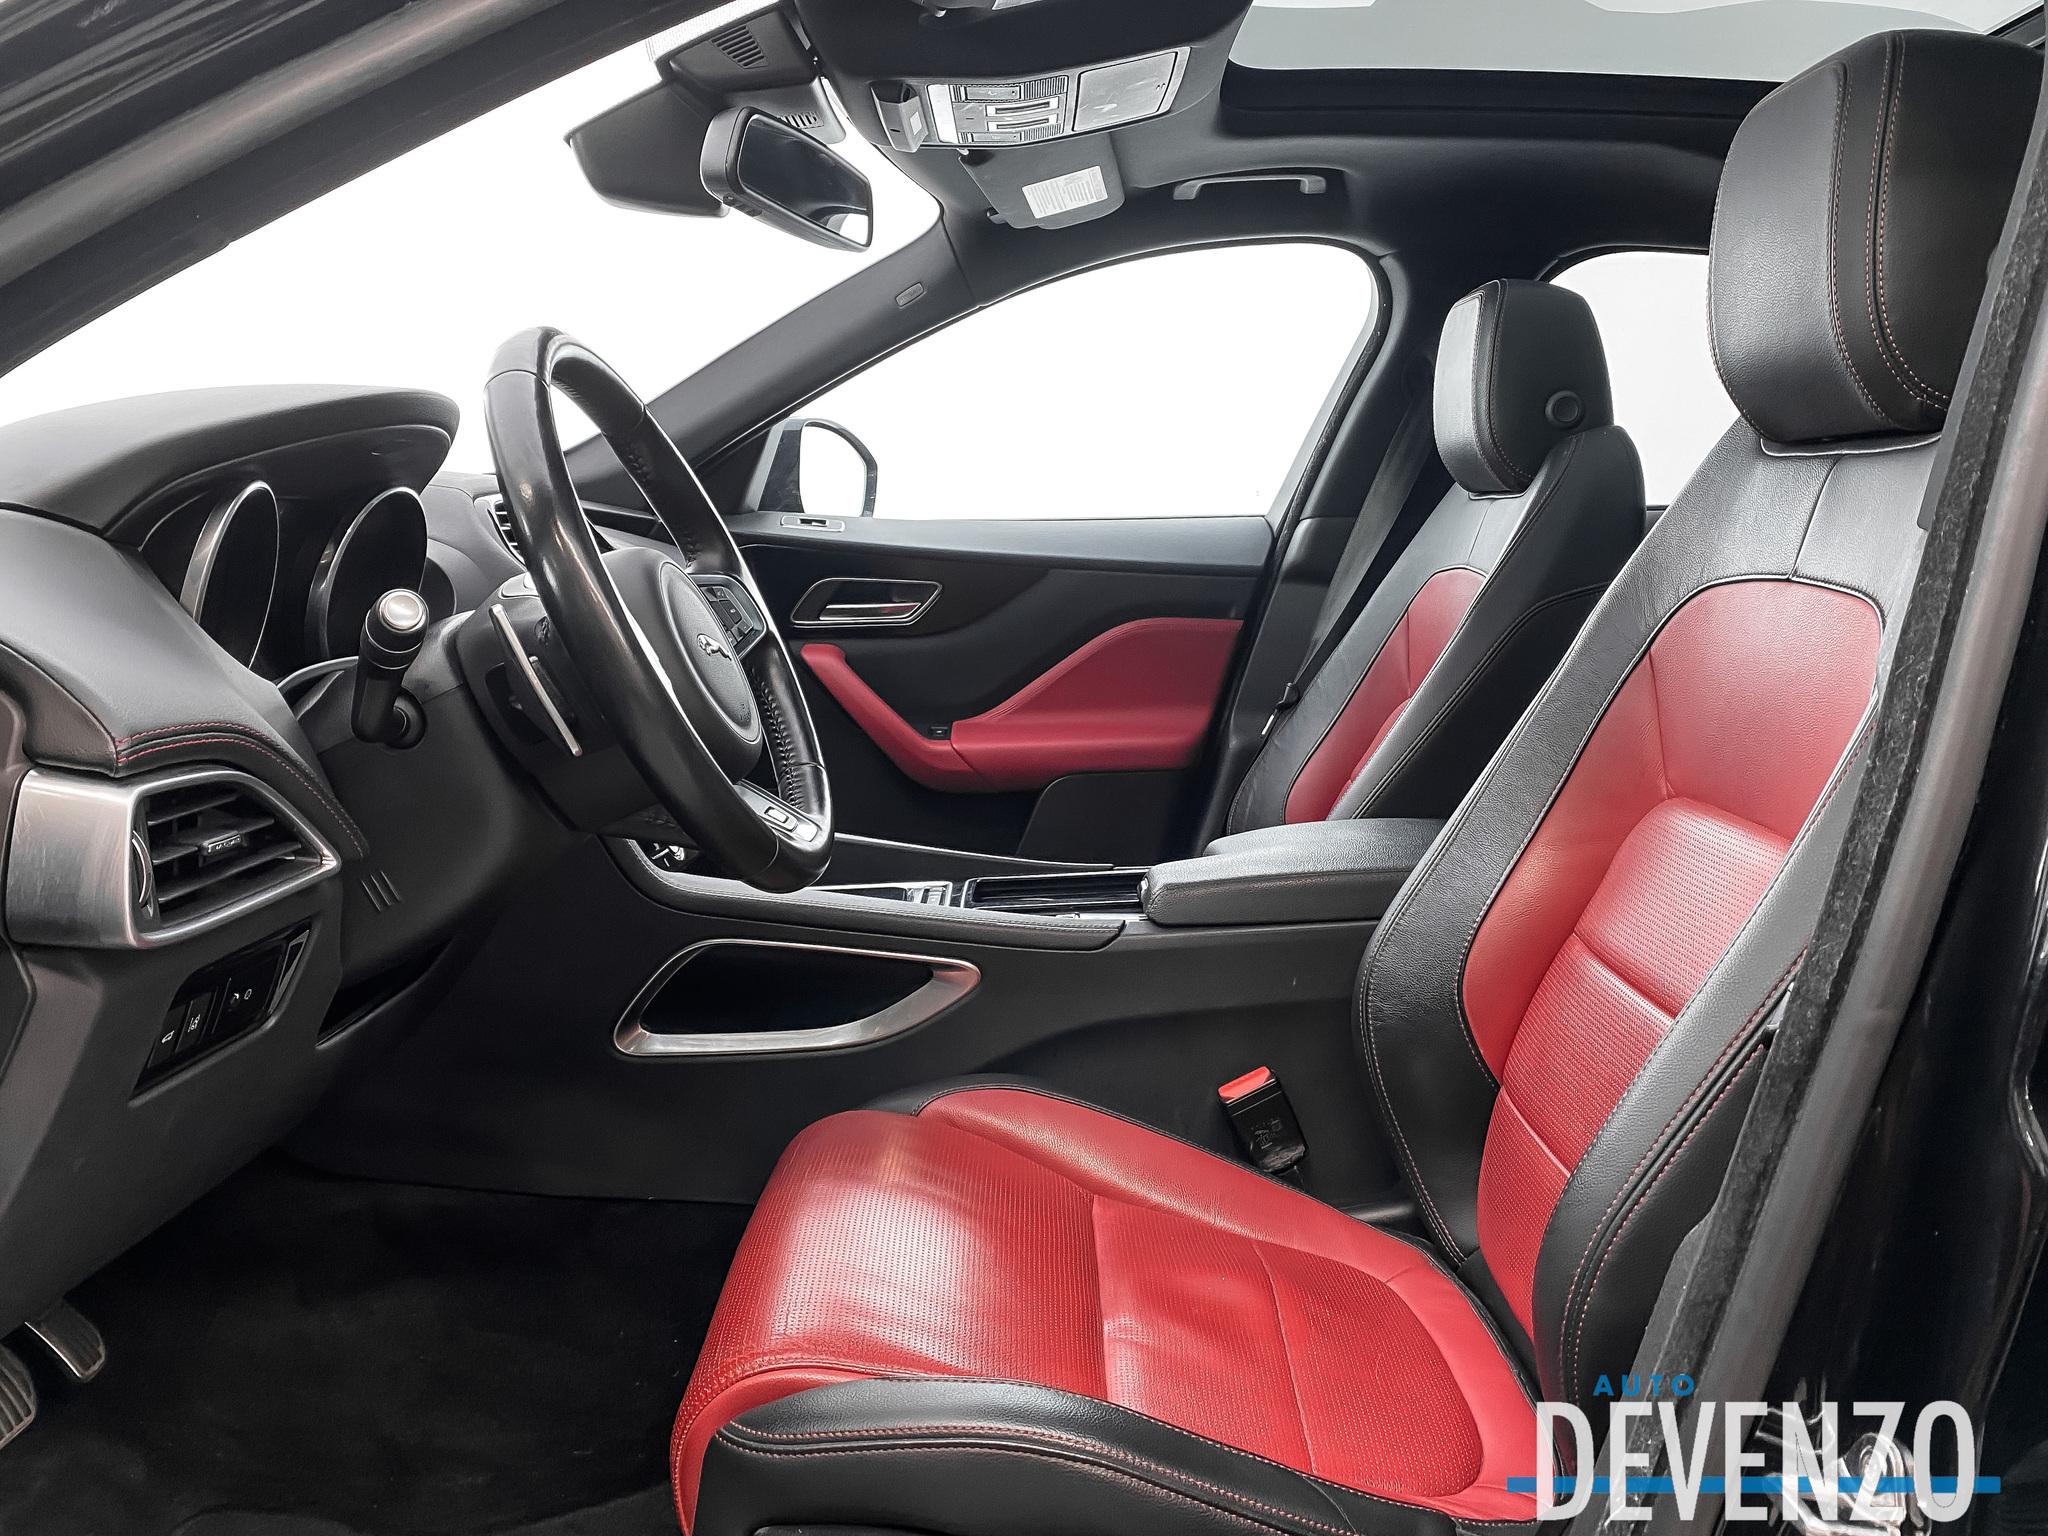 2018 Jaguar F-Pace 35t AWD R-Sport Black Package complet